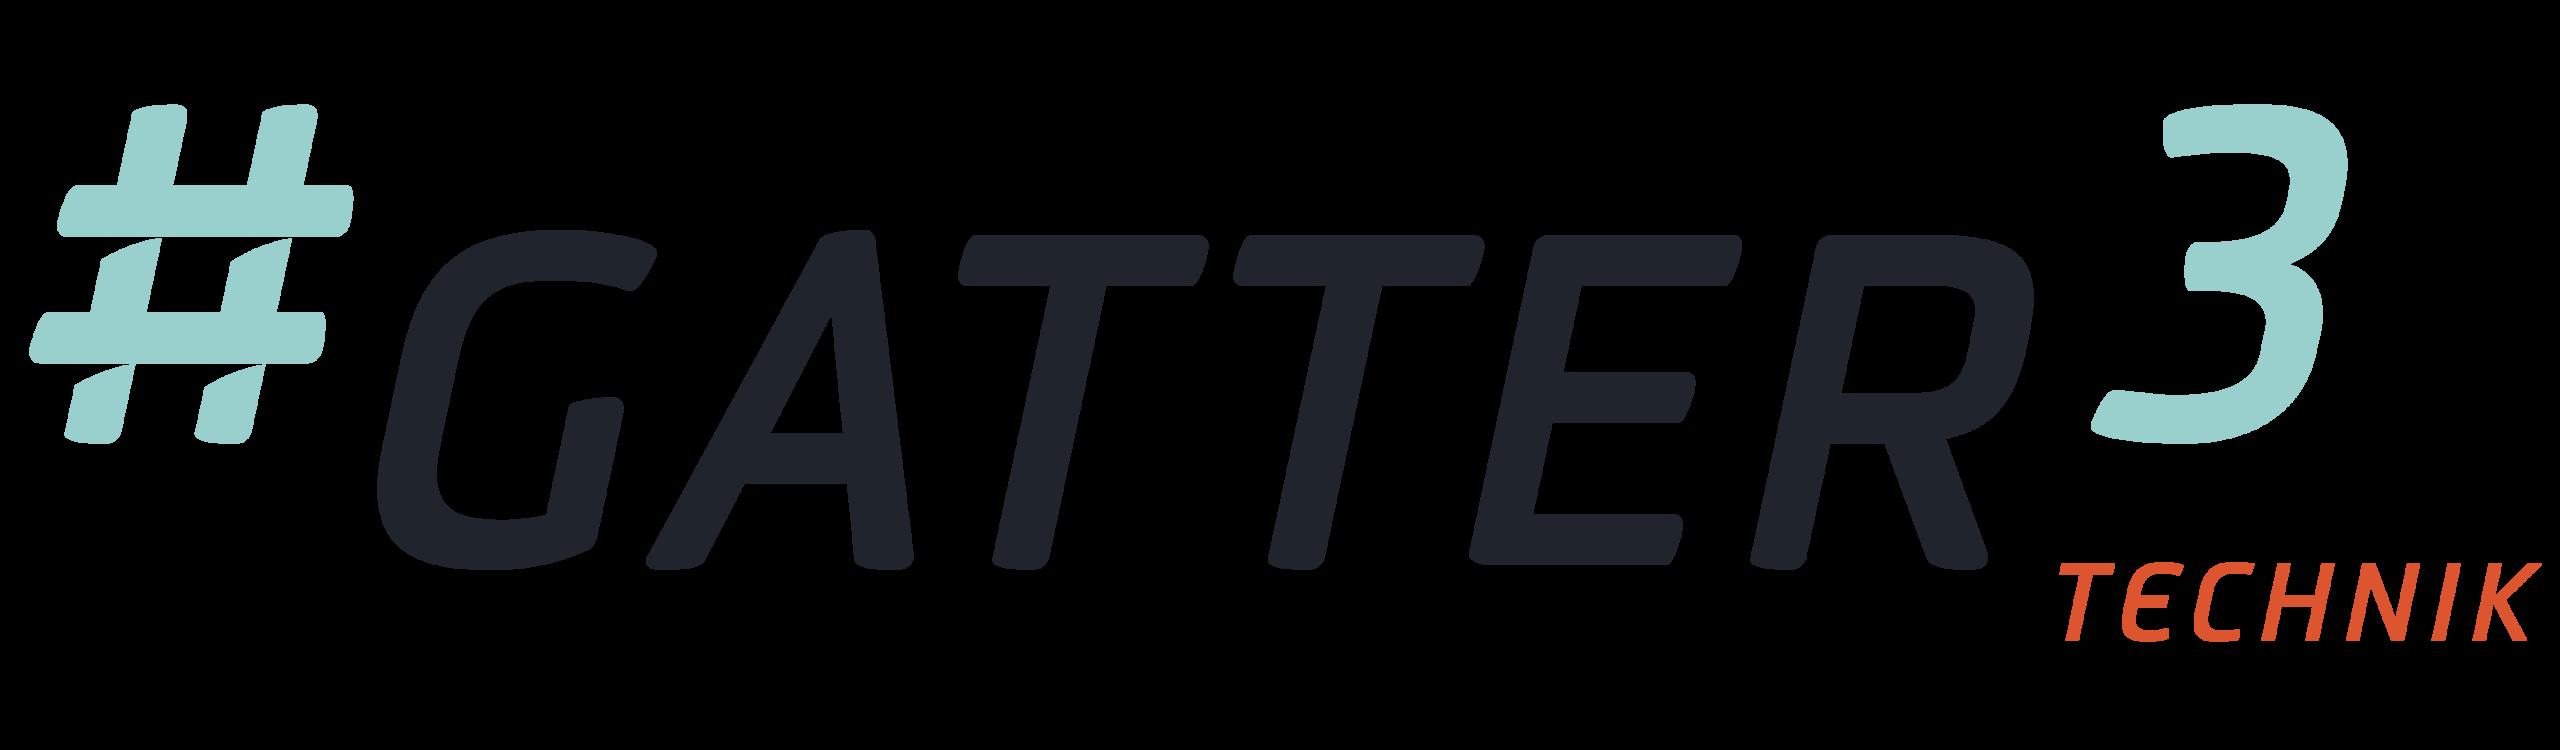 GATTER3